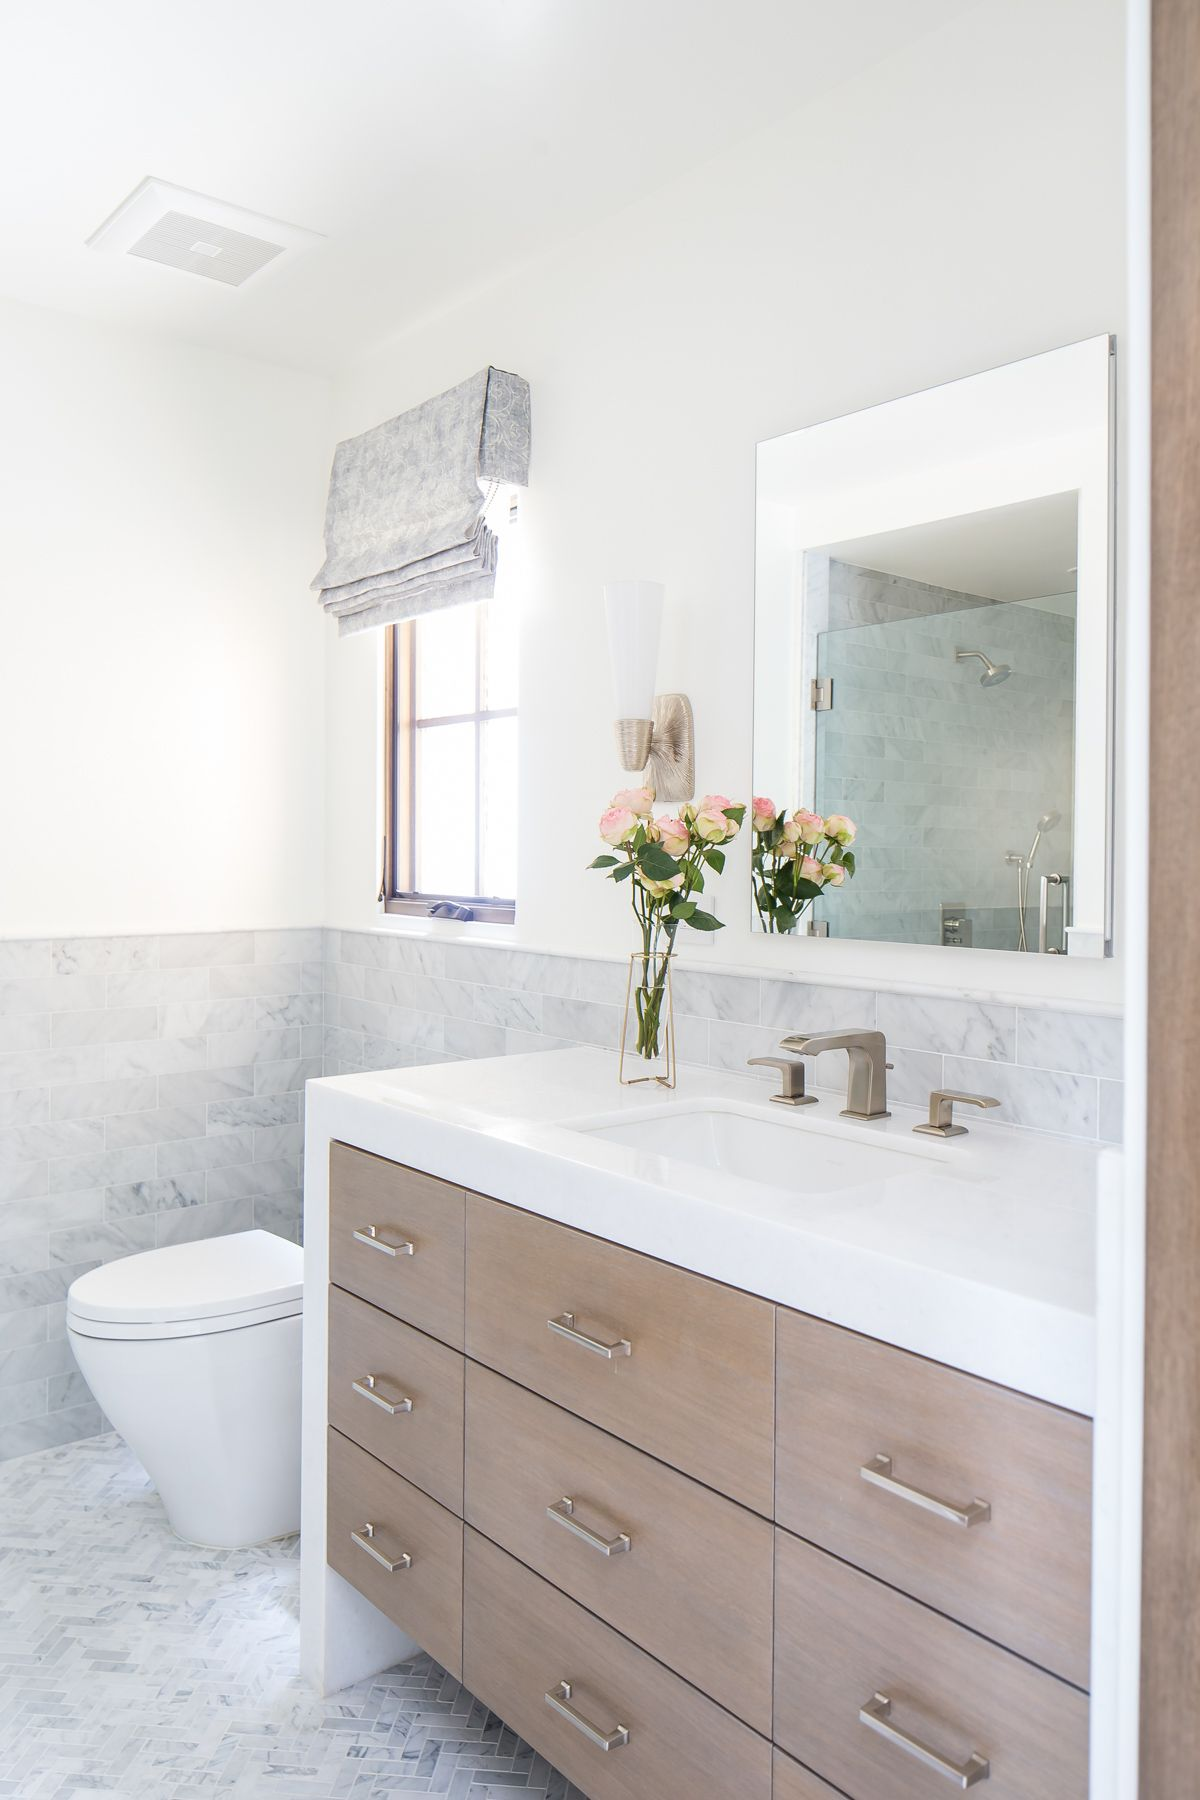 Blackband Design Waterfall Countertop, Waterfall Bathroom Vanity